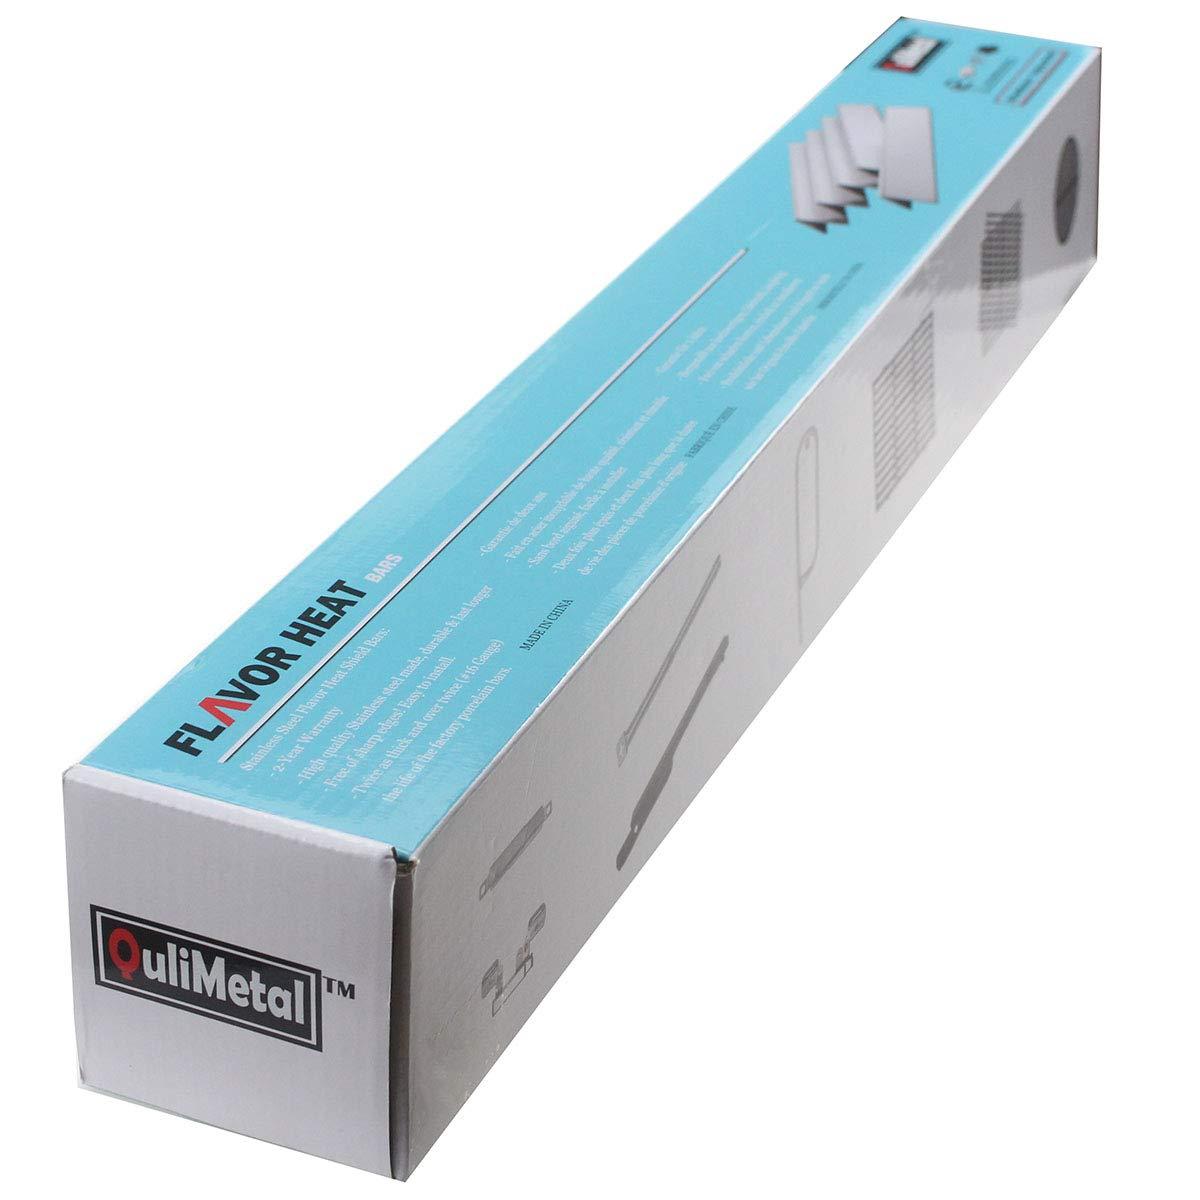 QuliMetal 7620, 16 Gauge, 17.5'' Stainless Steel Heat Shield for Weber Genesis Flavor Bars, Fit Genesis 300, E310, S310, E330, EP-330 by QuliMetal (Image #6)